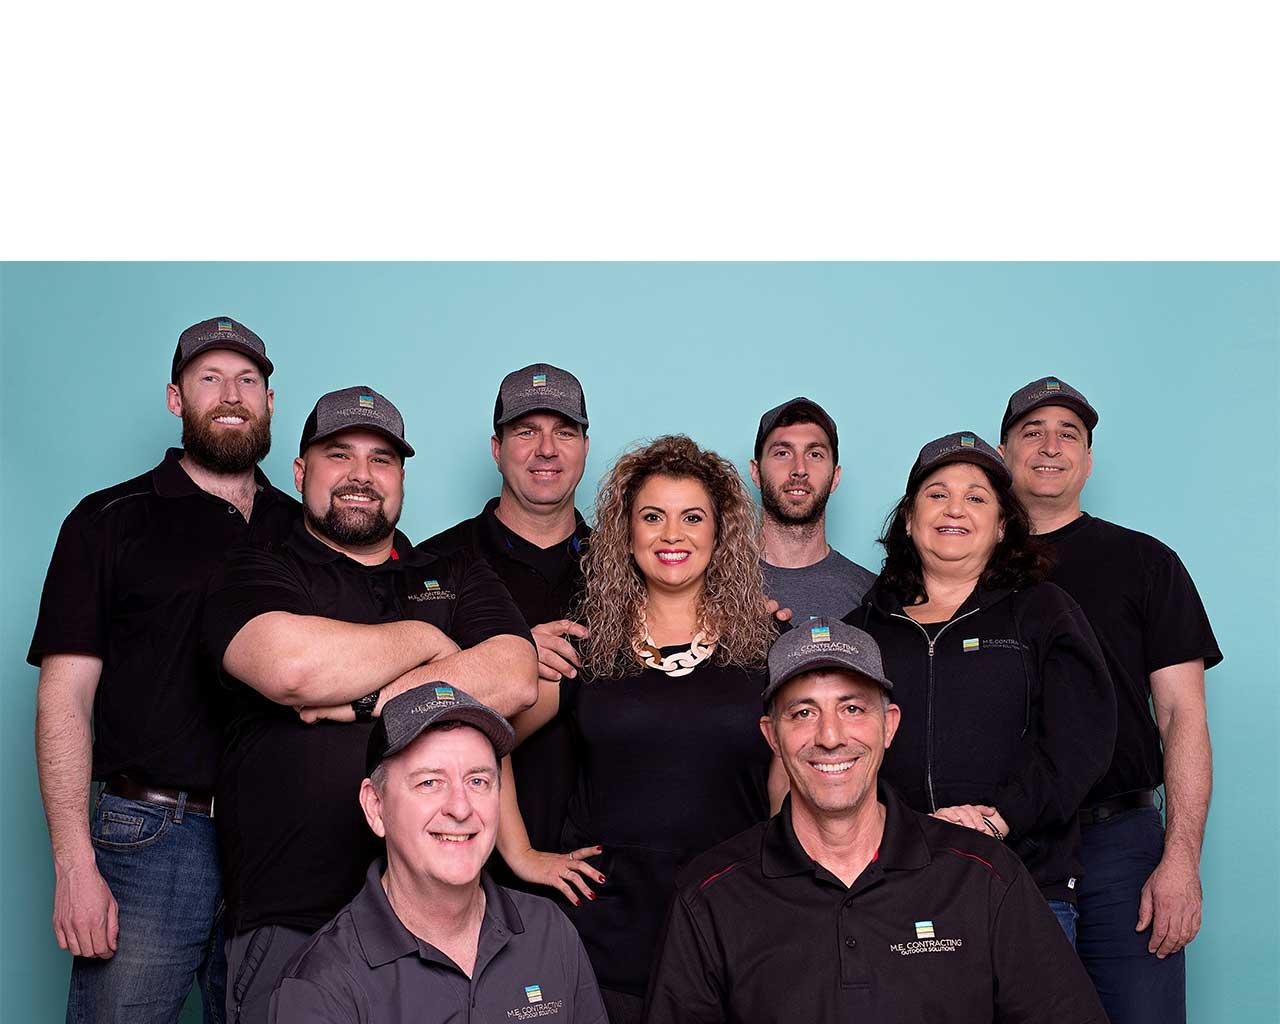 M.E Contracting Professional team